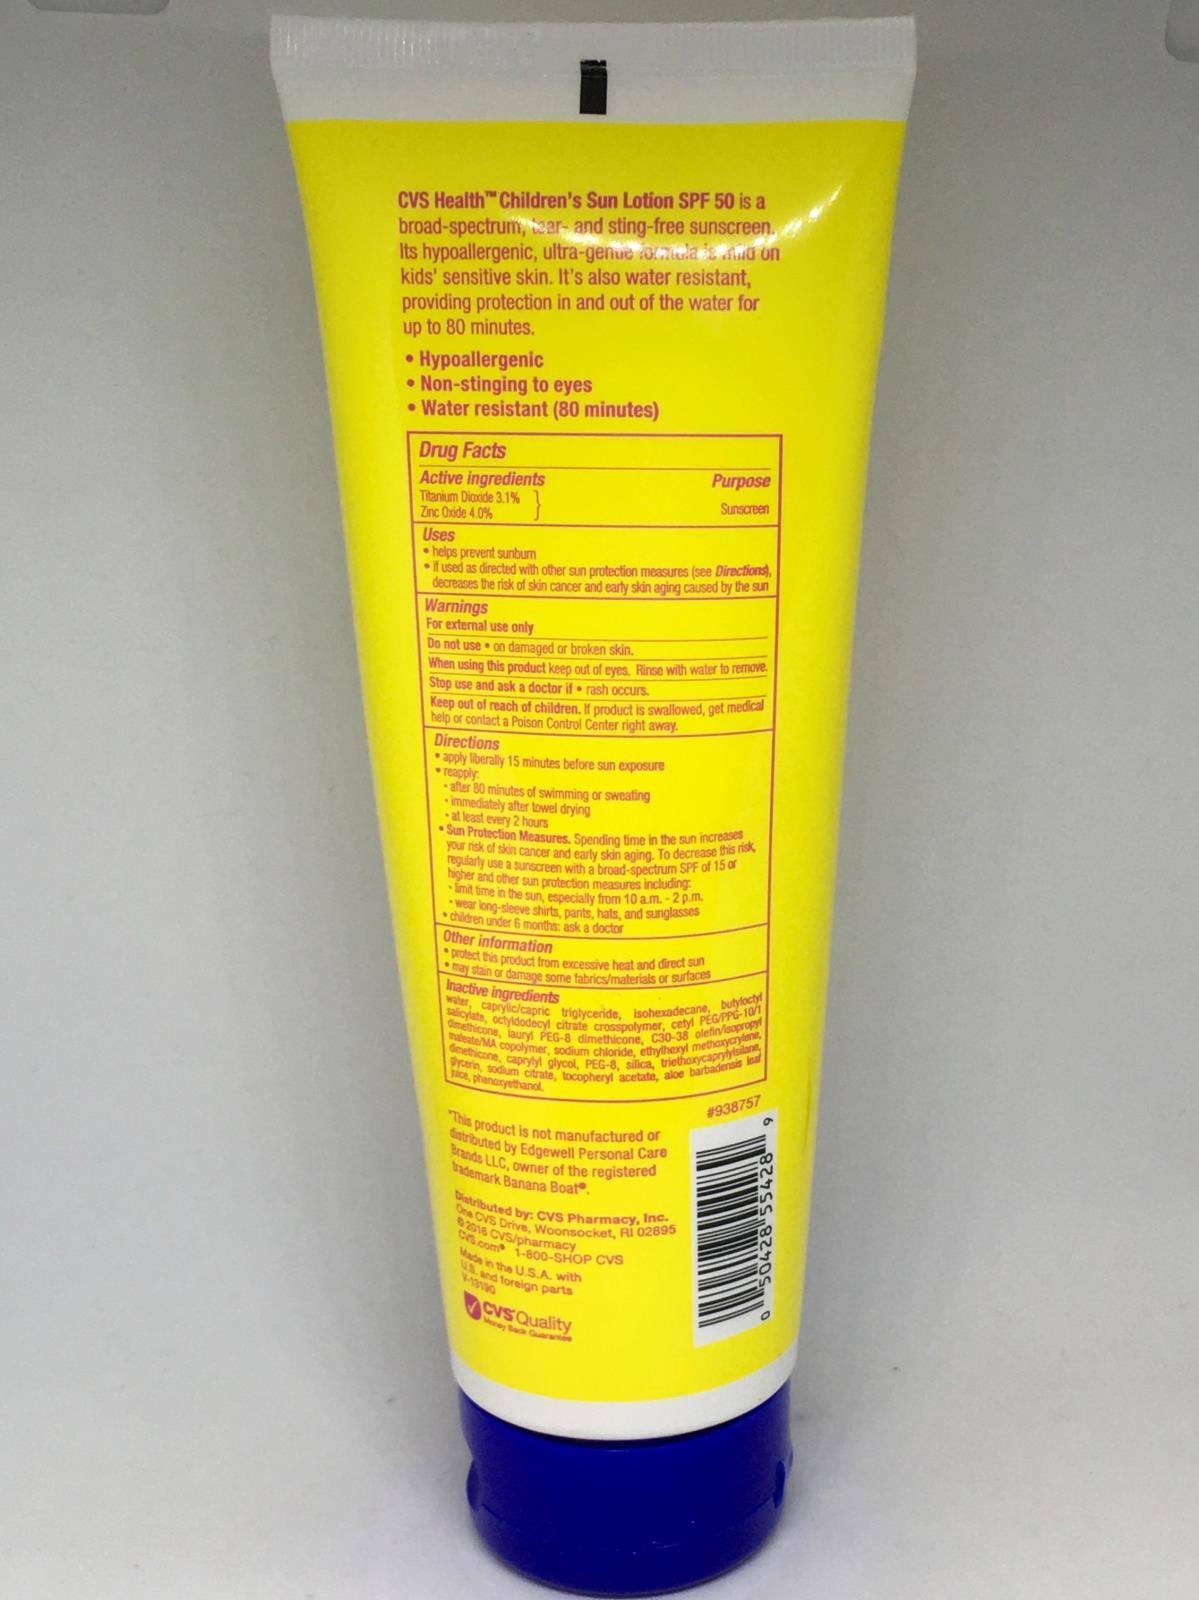 CVS Health Children's 50 Sun Lotion Broad Spectrum SPF 50 Sunscreen 4